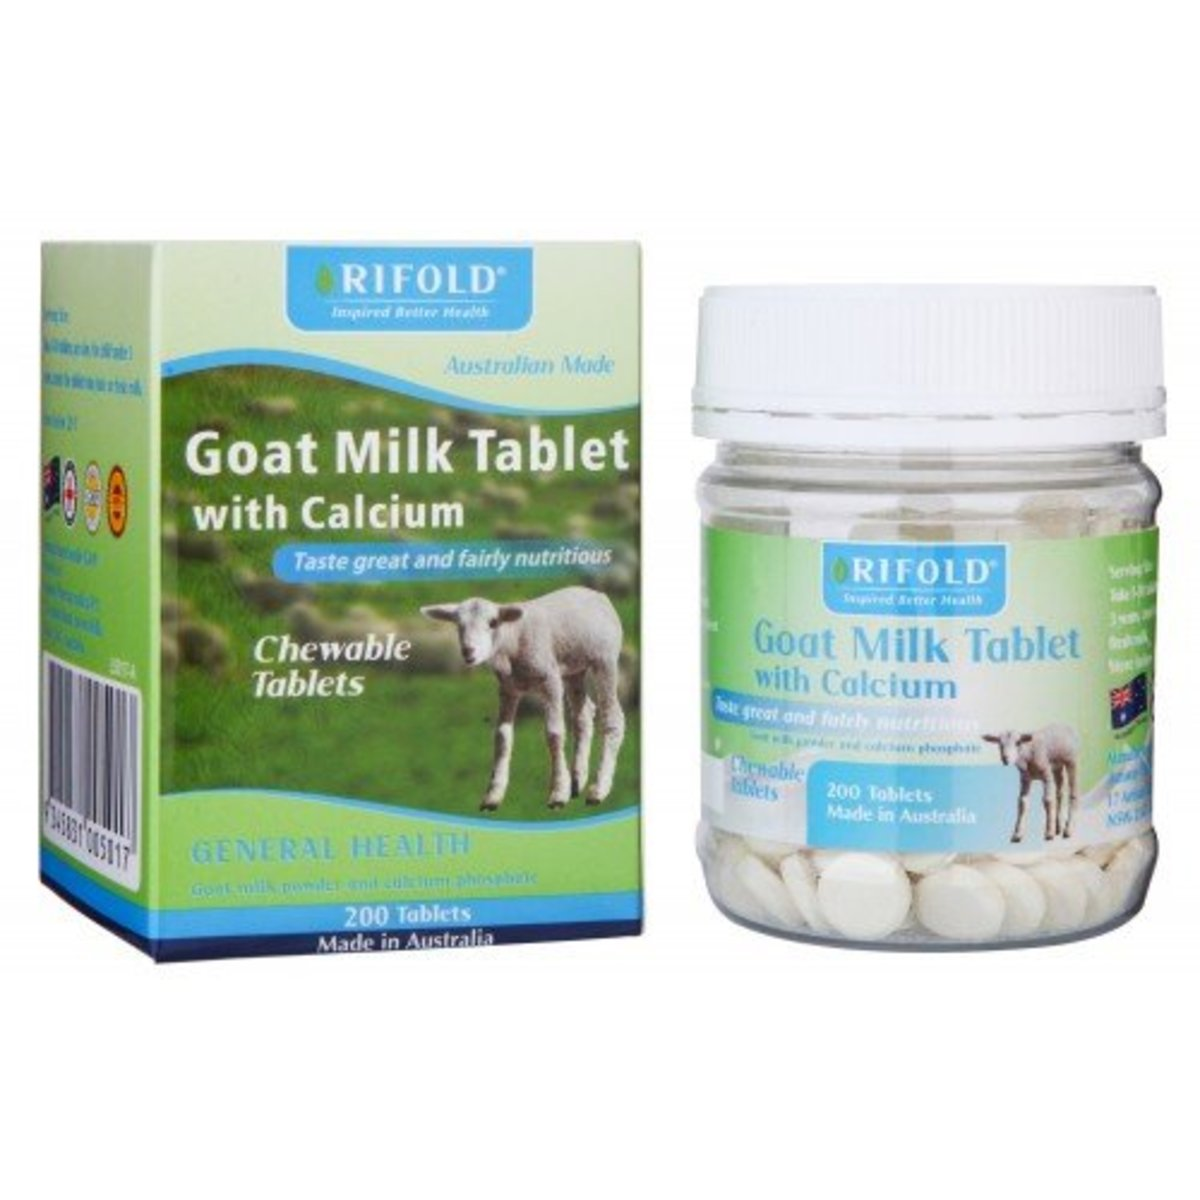 Goat Milk Tablet with Calcium[Authorized goods]